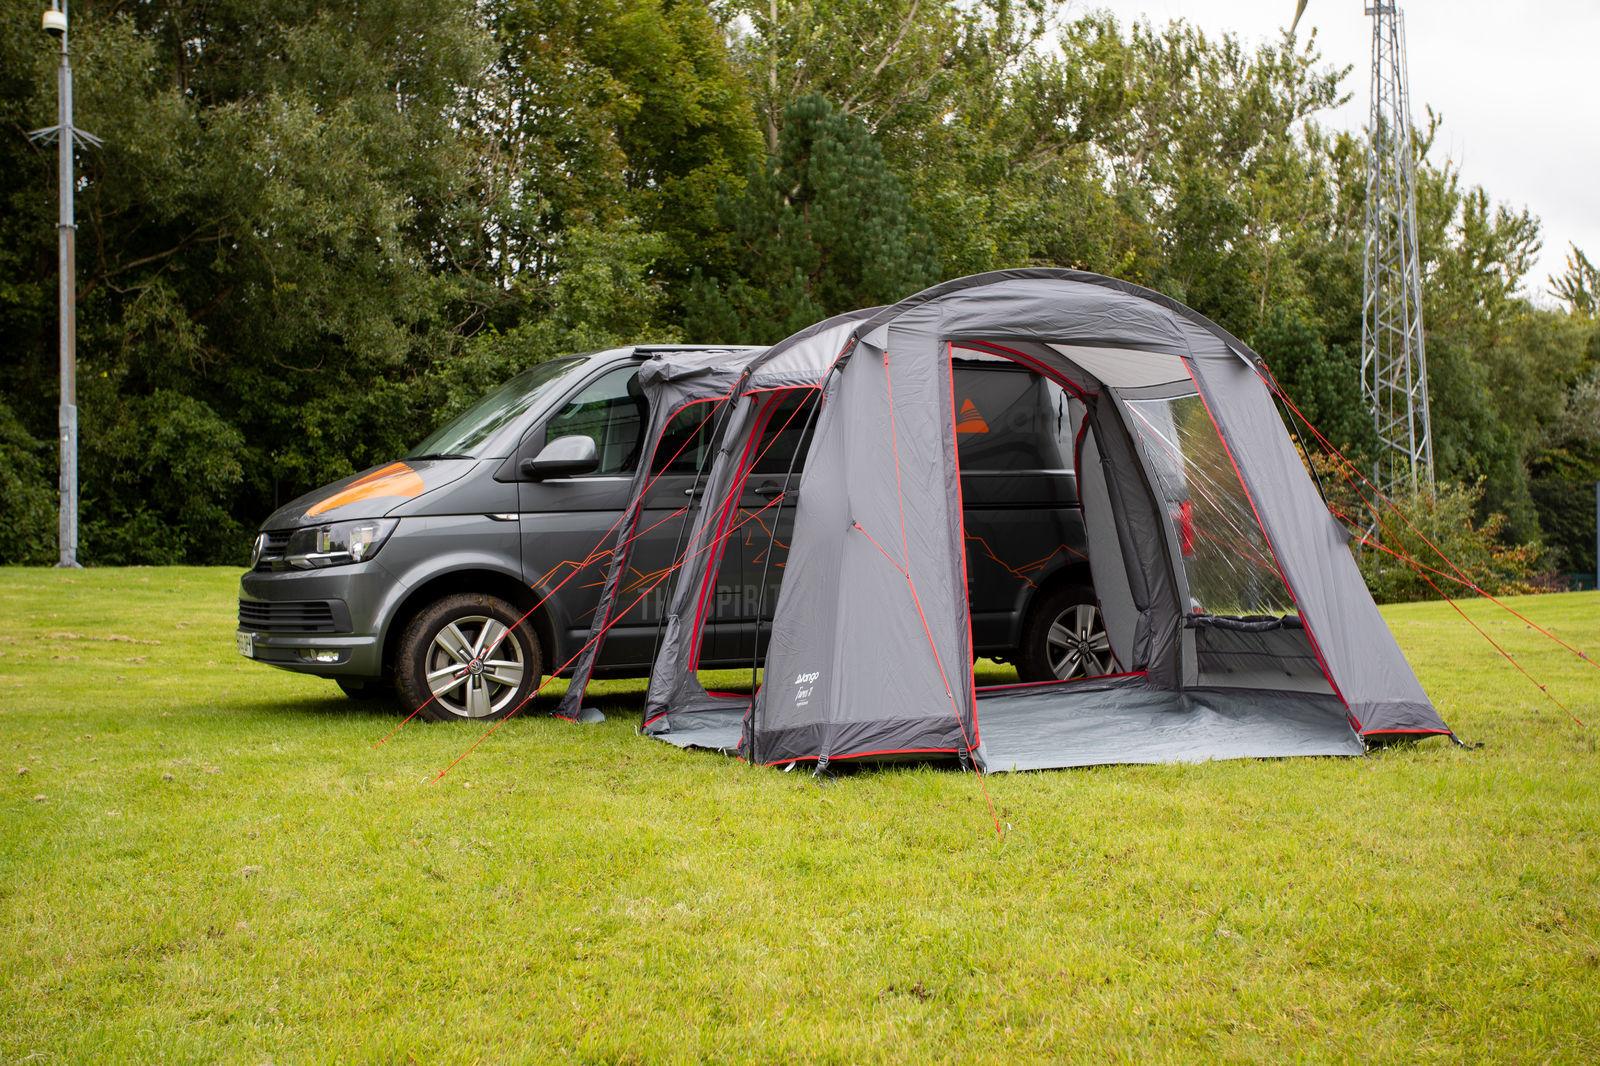 Vango Faros Low Poled 2021 Norwich Camping 7